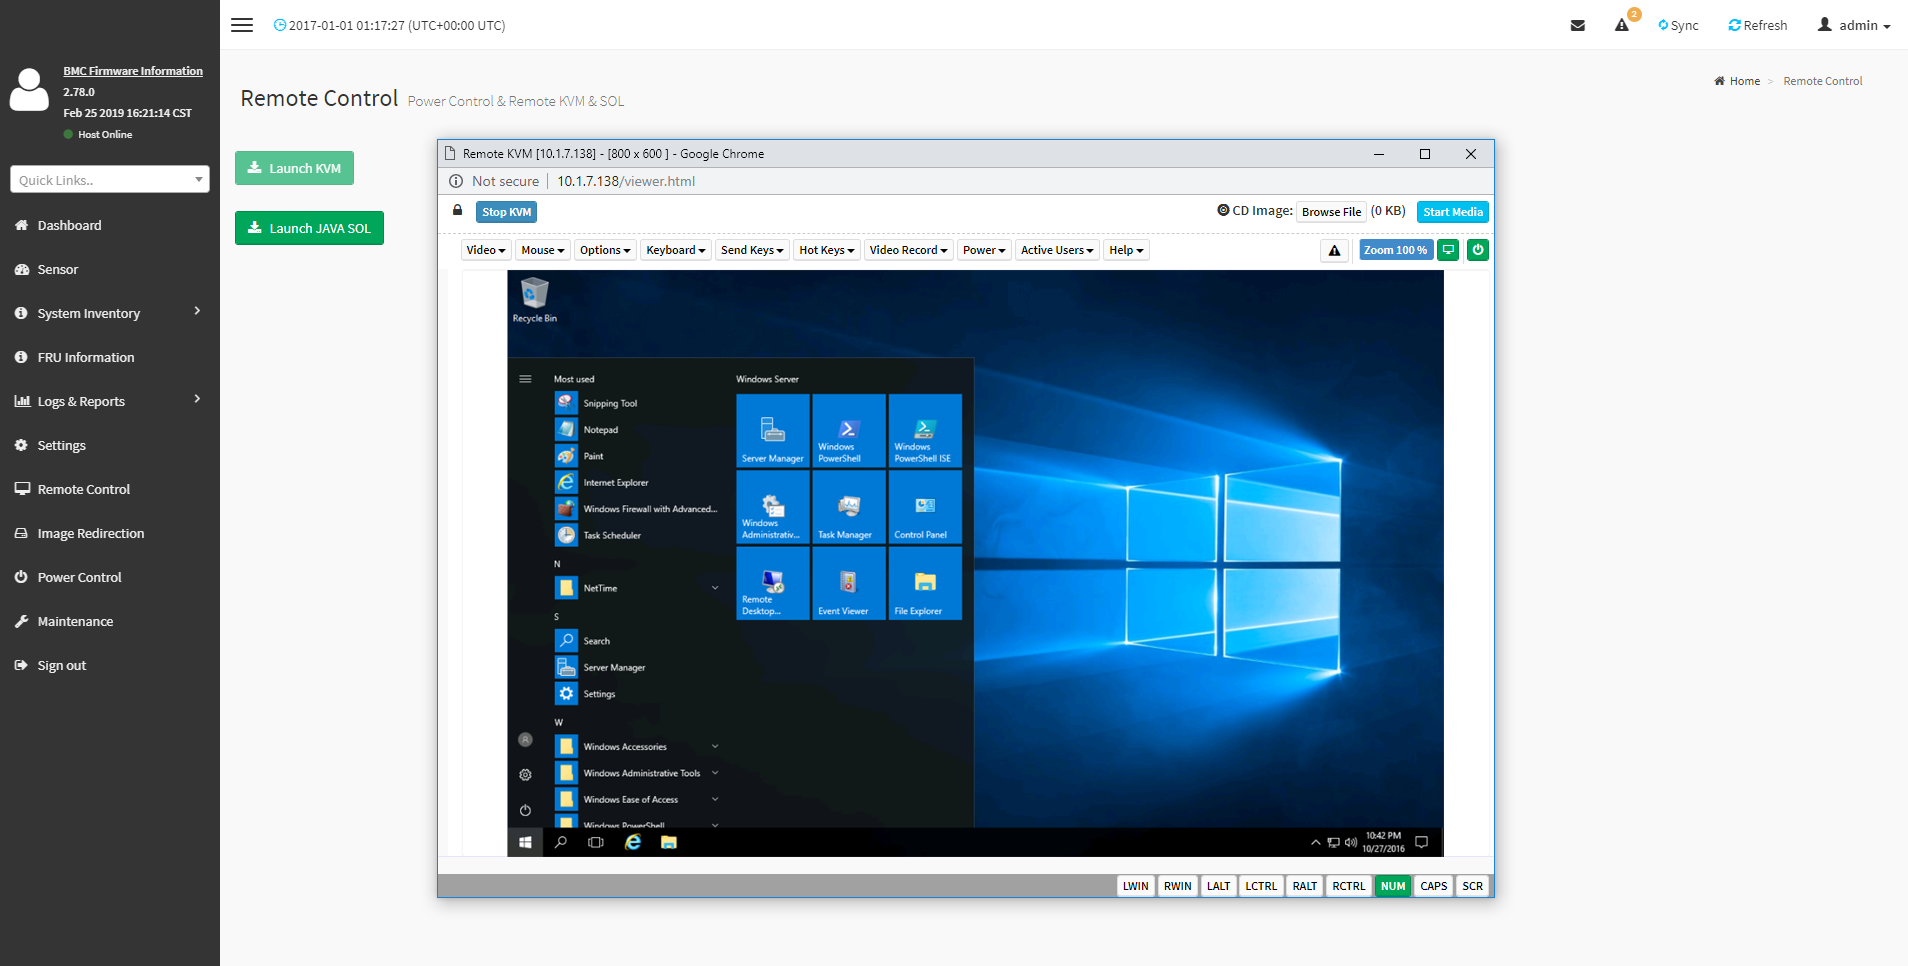 MX32-4L0 (rev  1 0) | Server Motherboard - GIGABYTE Global